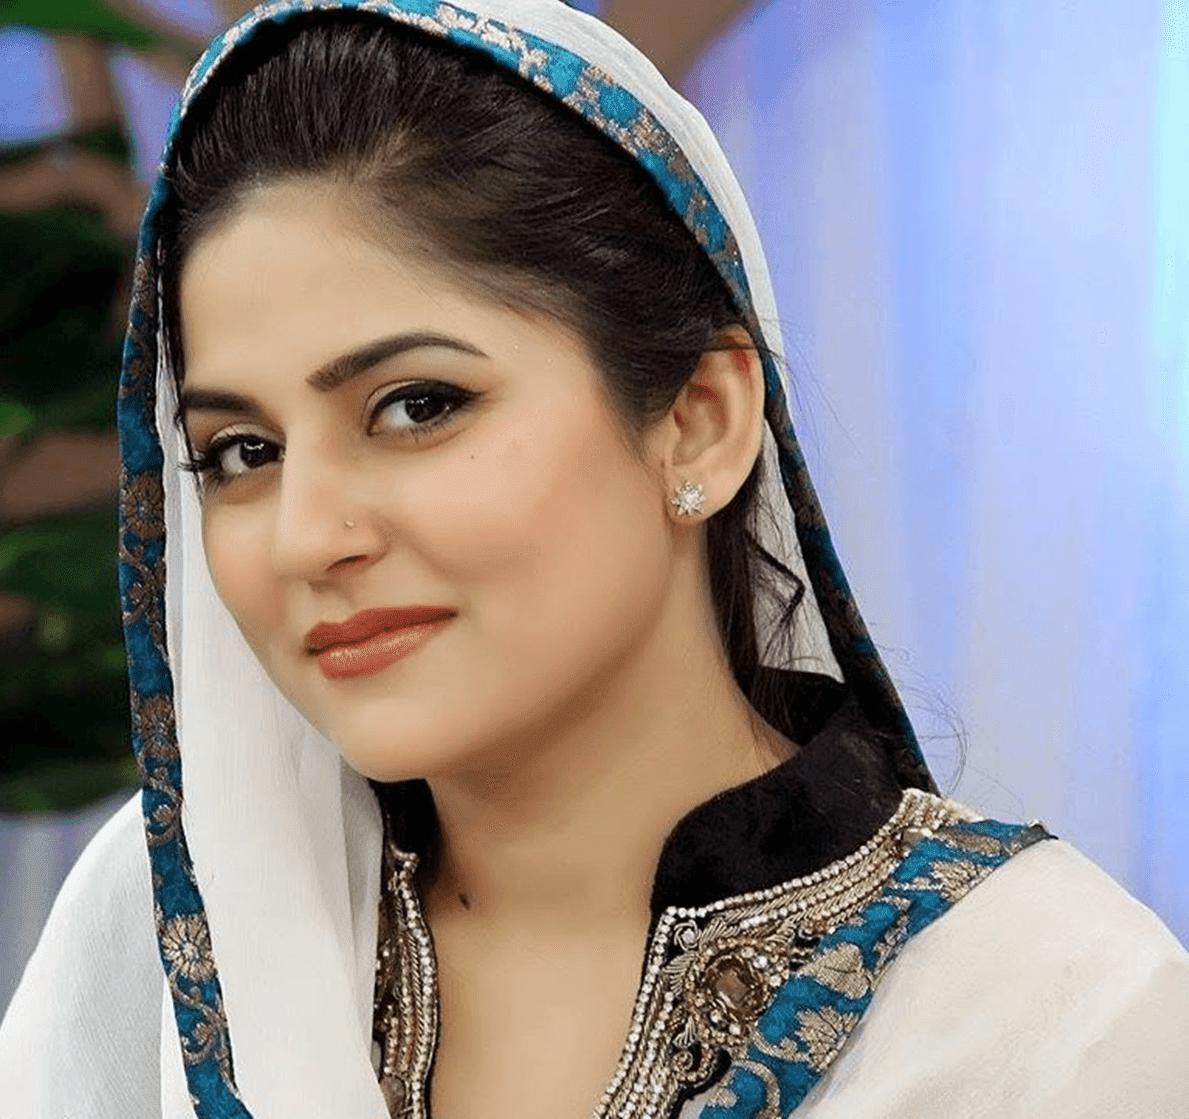 sanam bloach pakistani lollywood actress hd wallpaper